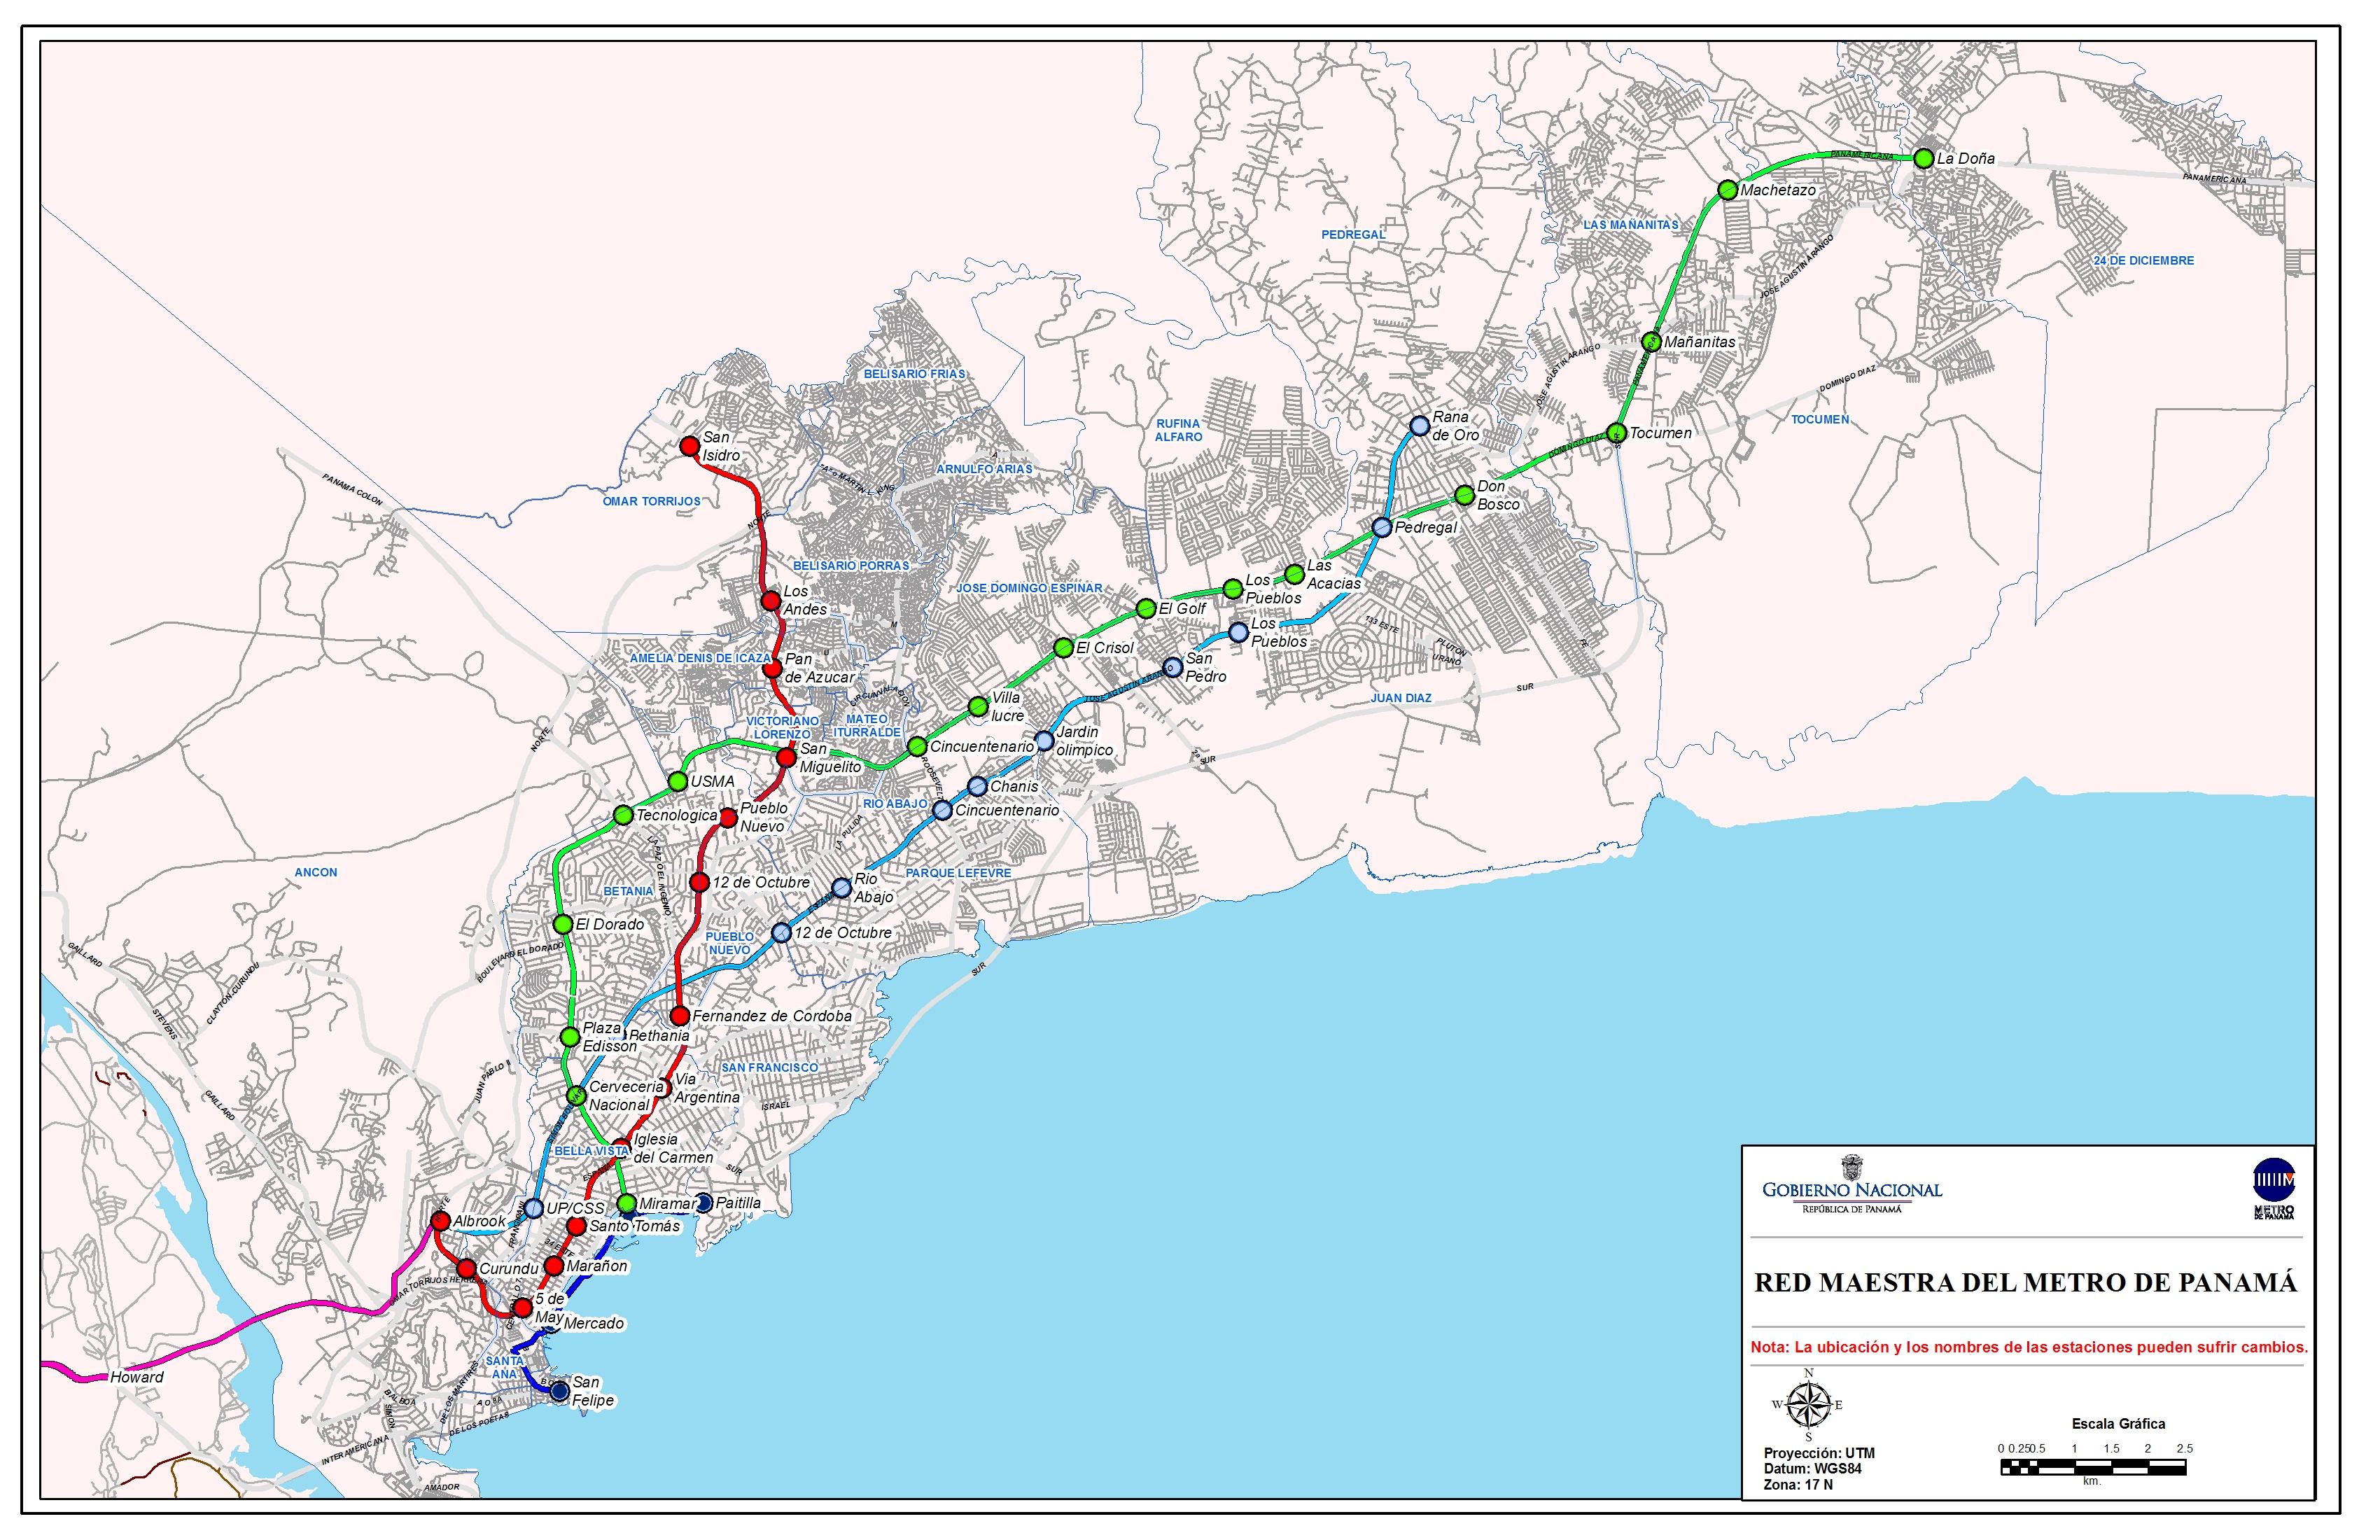 Panama Subway Map.Panama Metro Subway And Metro Train Maps